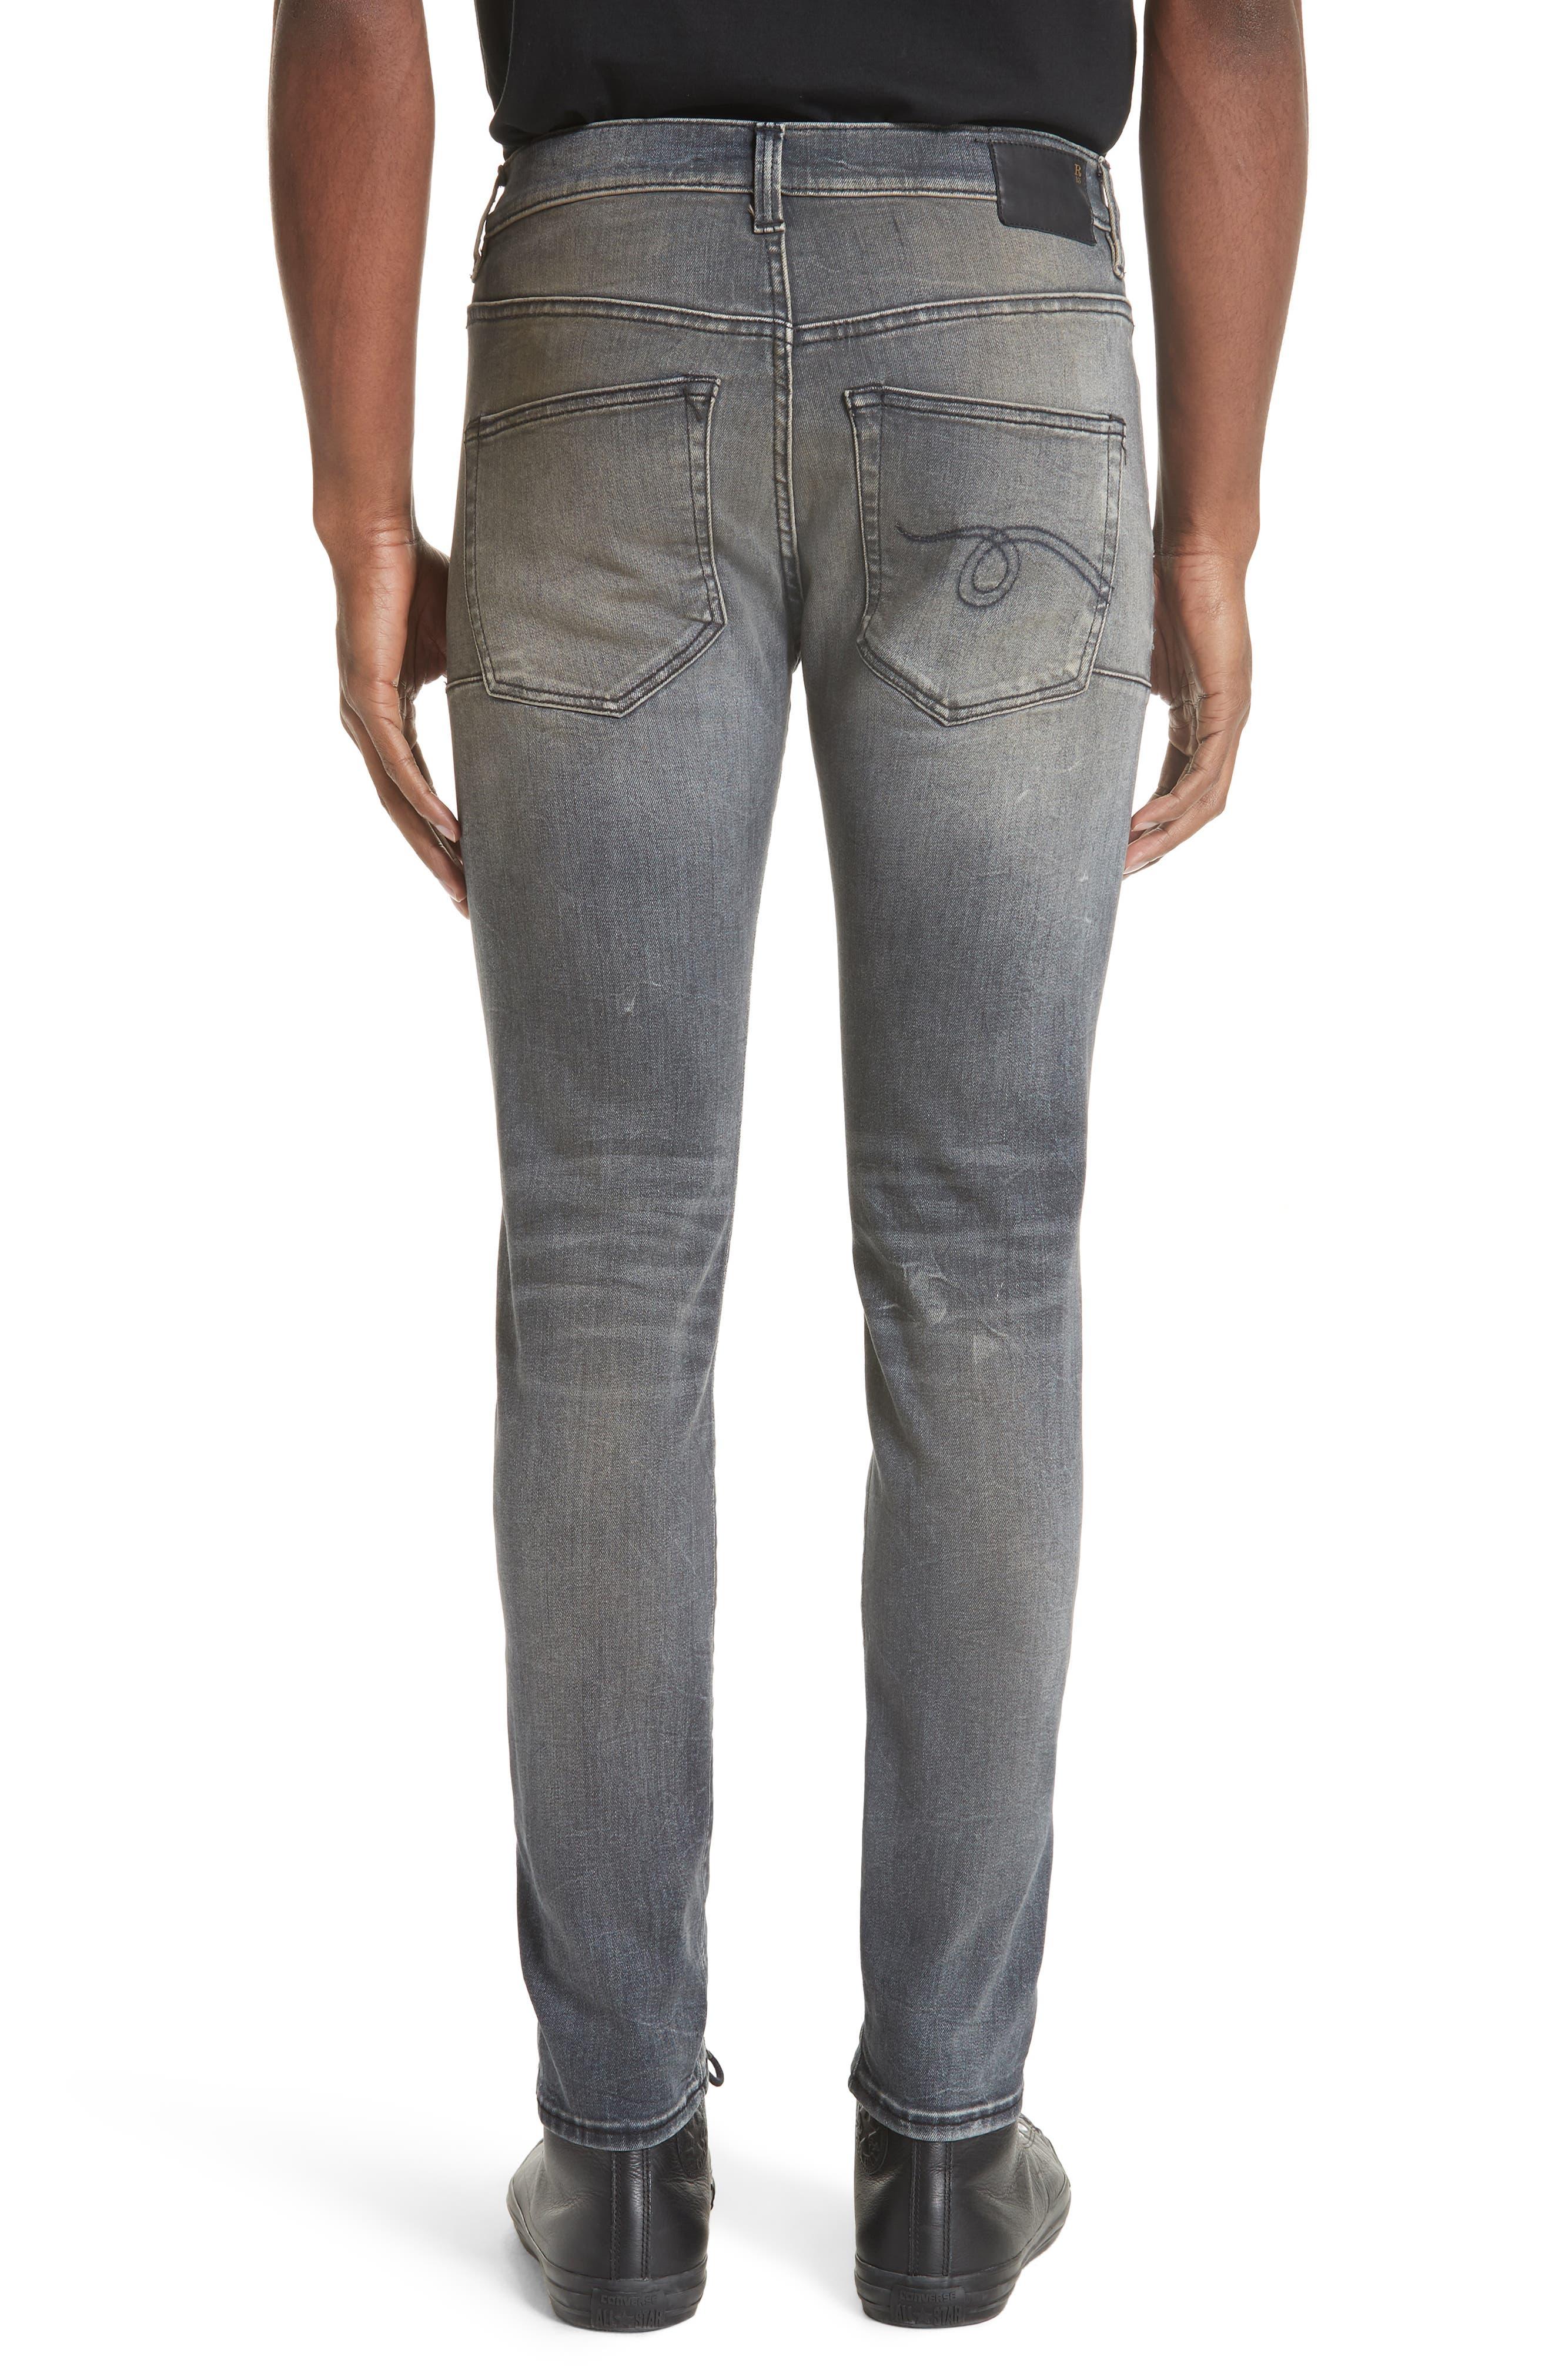 Skate Slim Fit Jeans,                             Alternate thumbnail 2, color,                             001